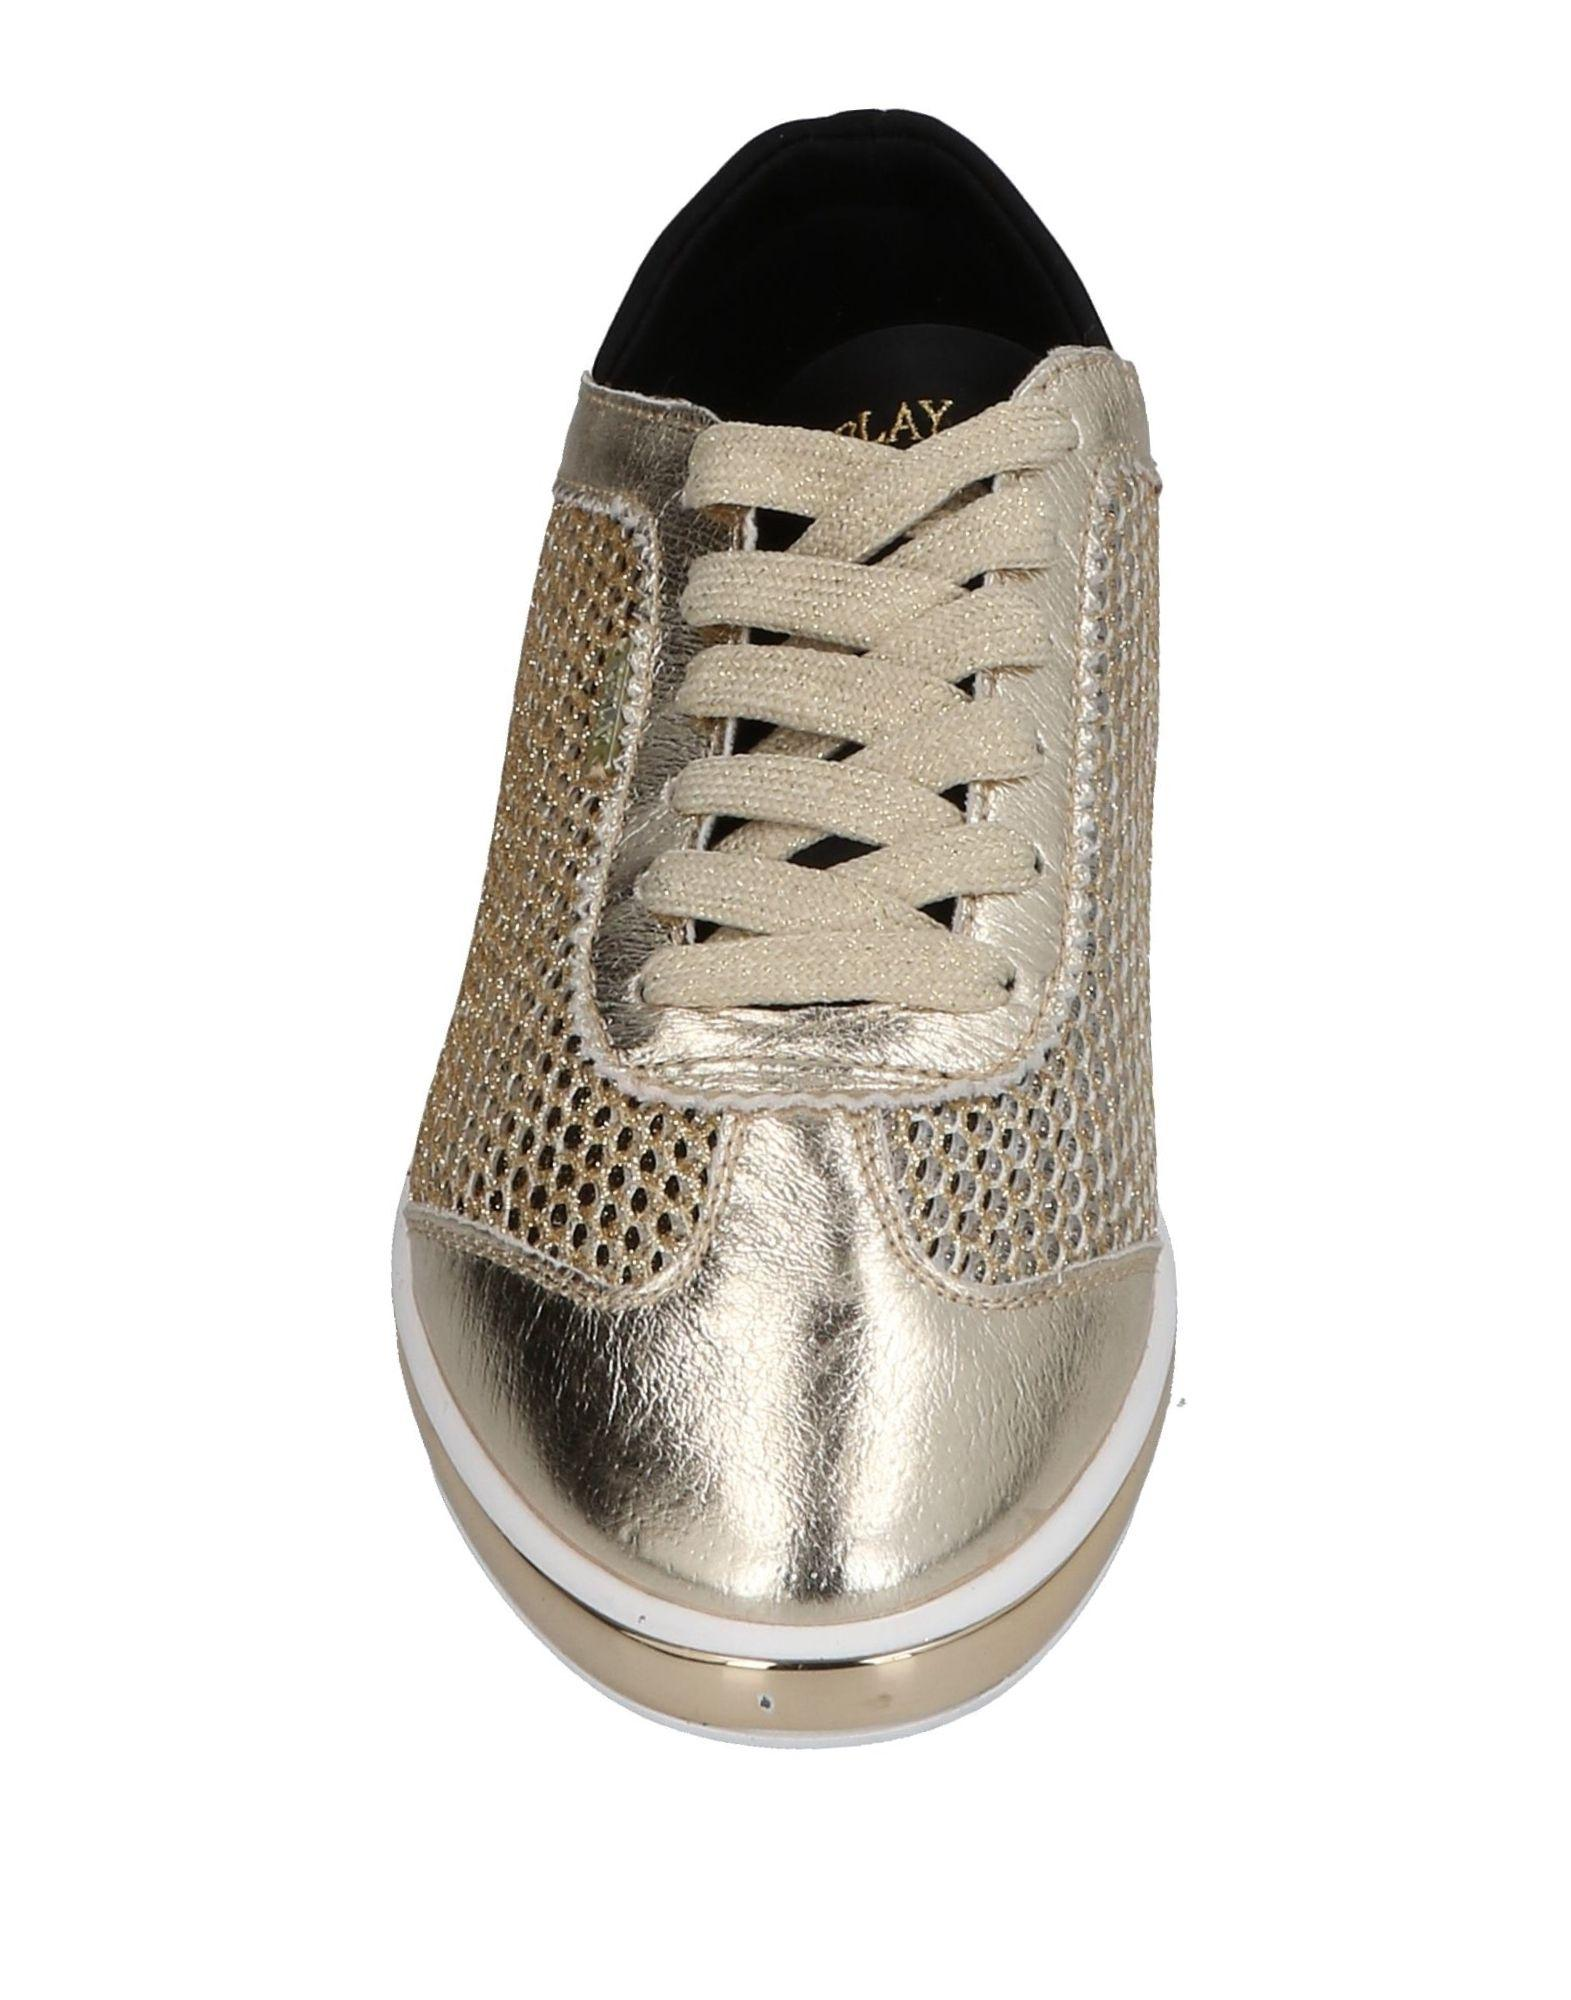 Replay Low-tops & Sneakers in Gold (Metallic)